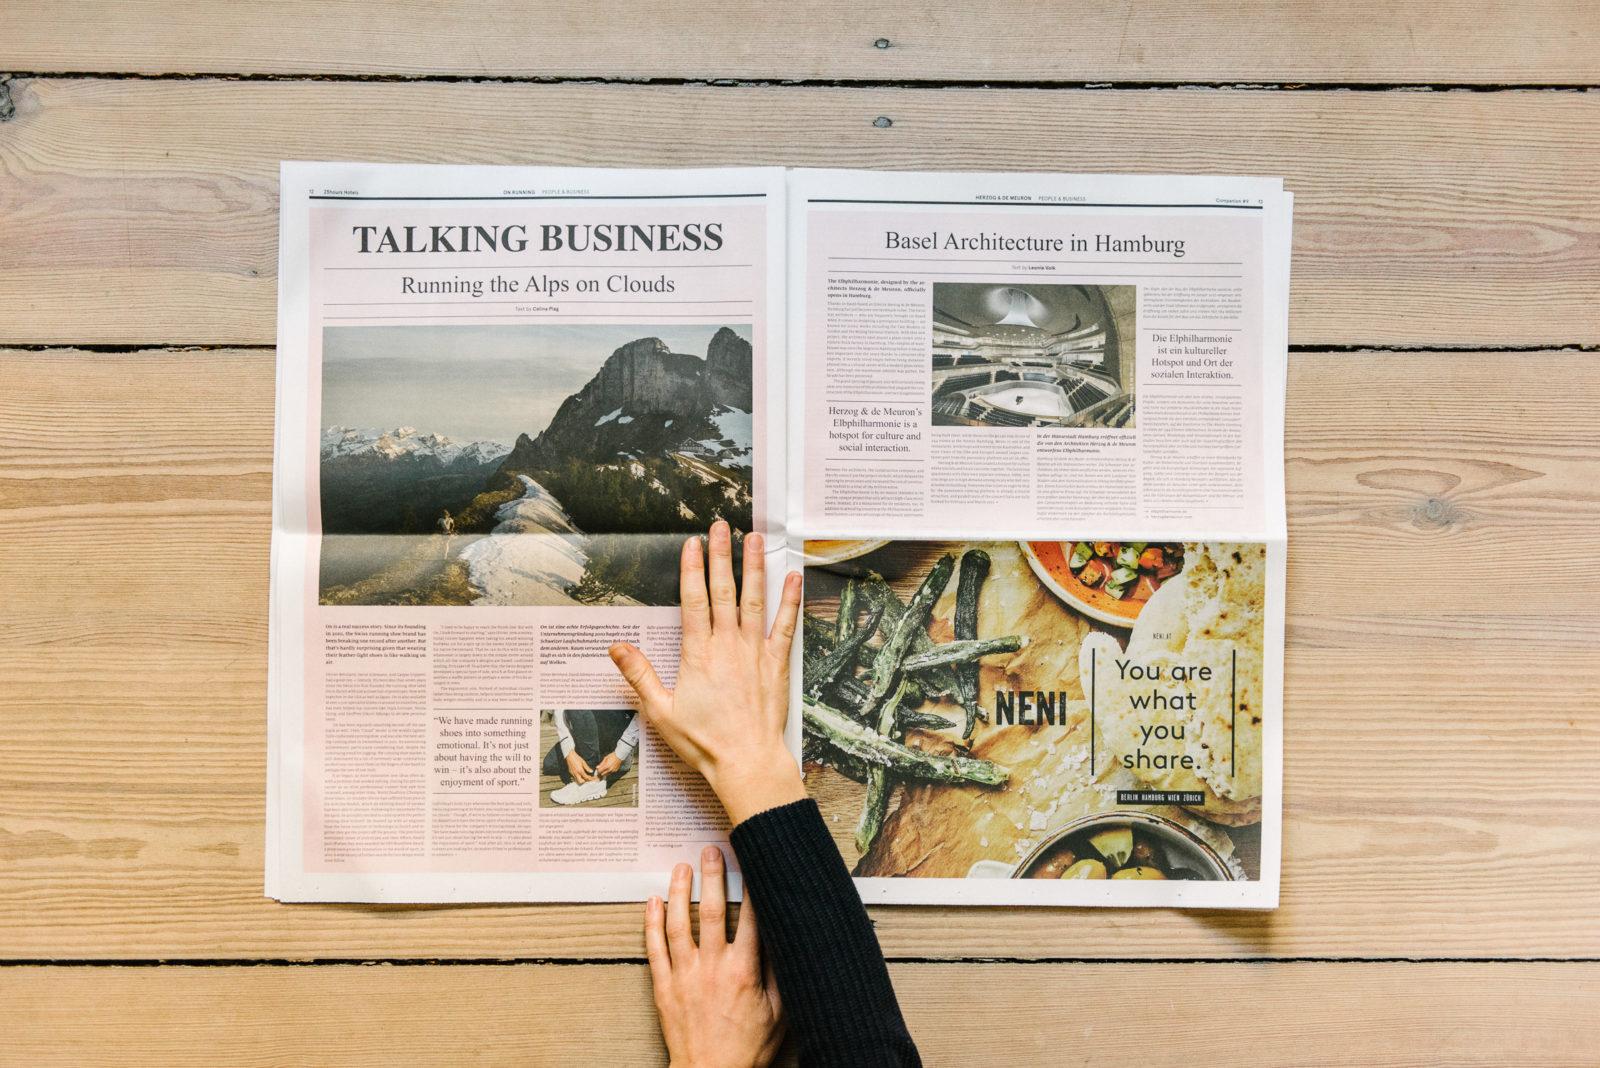 Talking Business  with the Elbphilarmonie